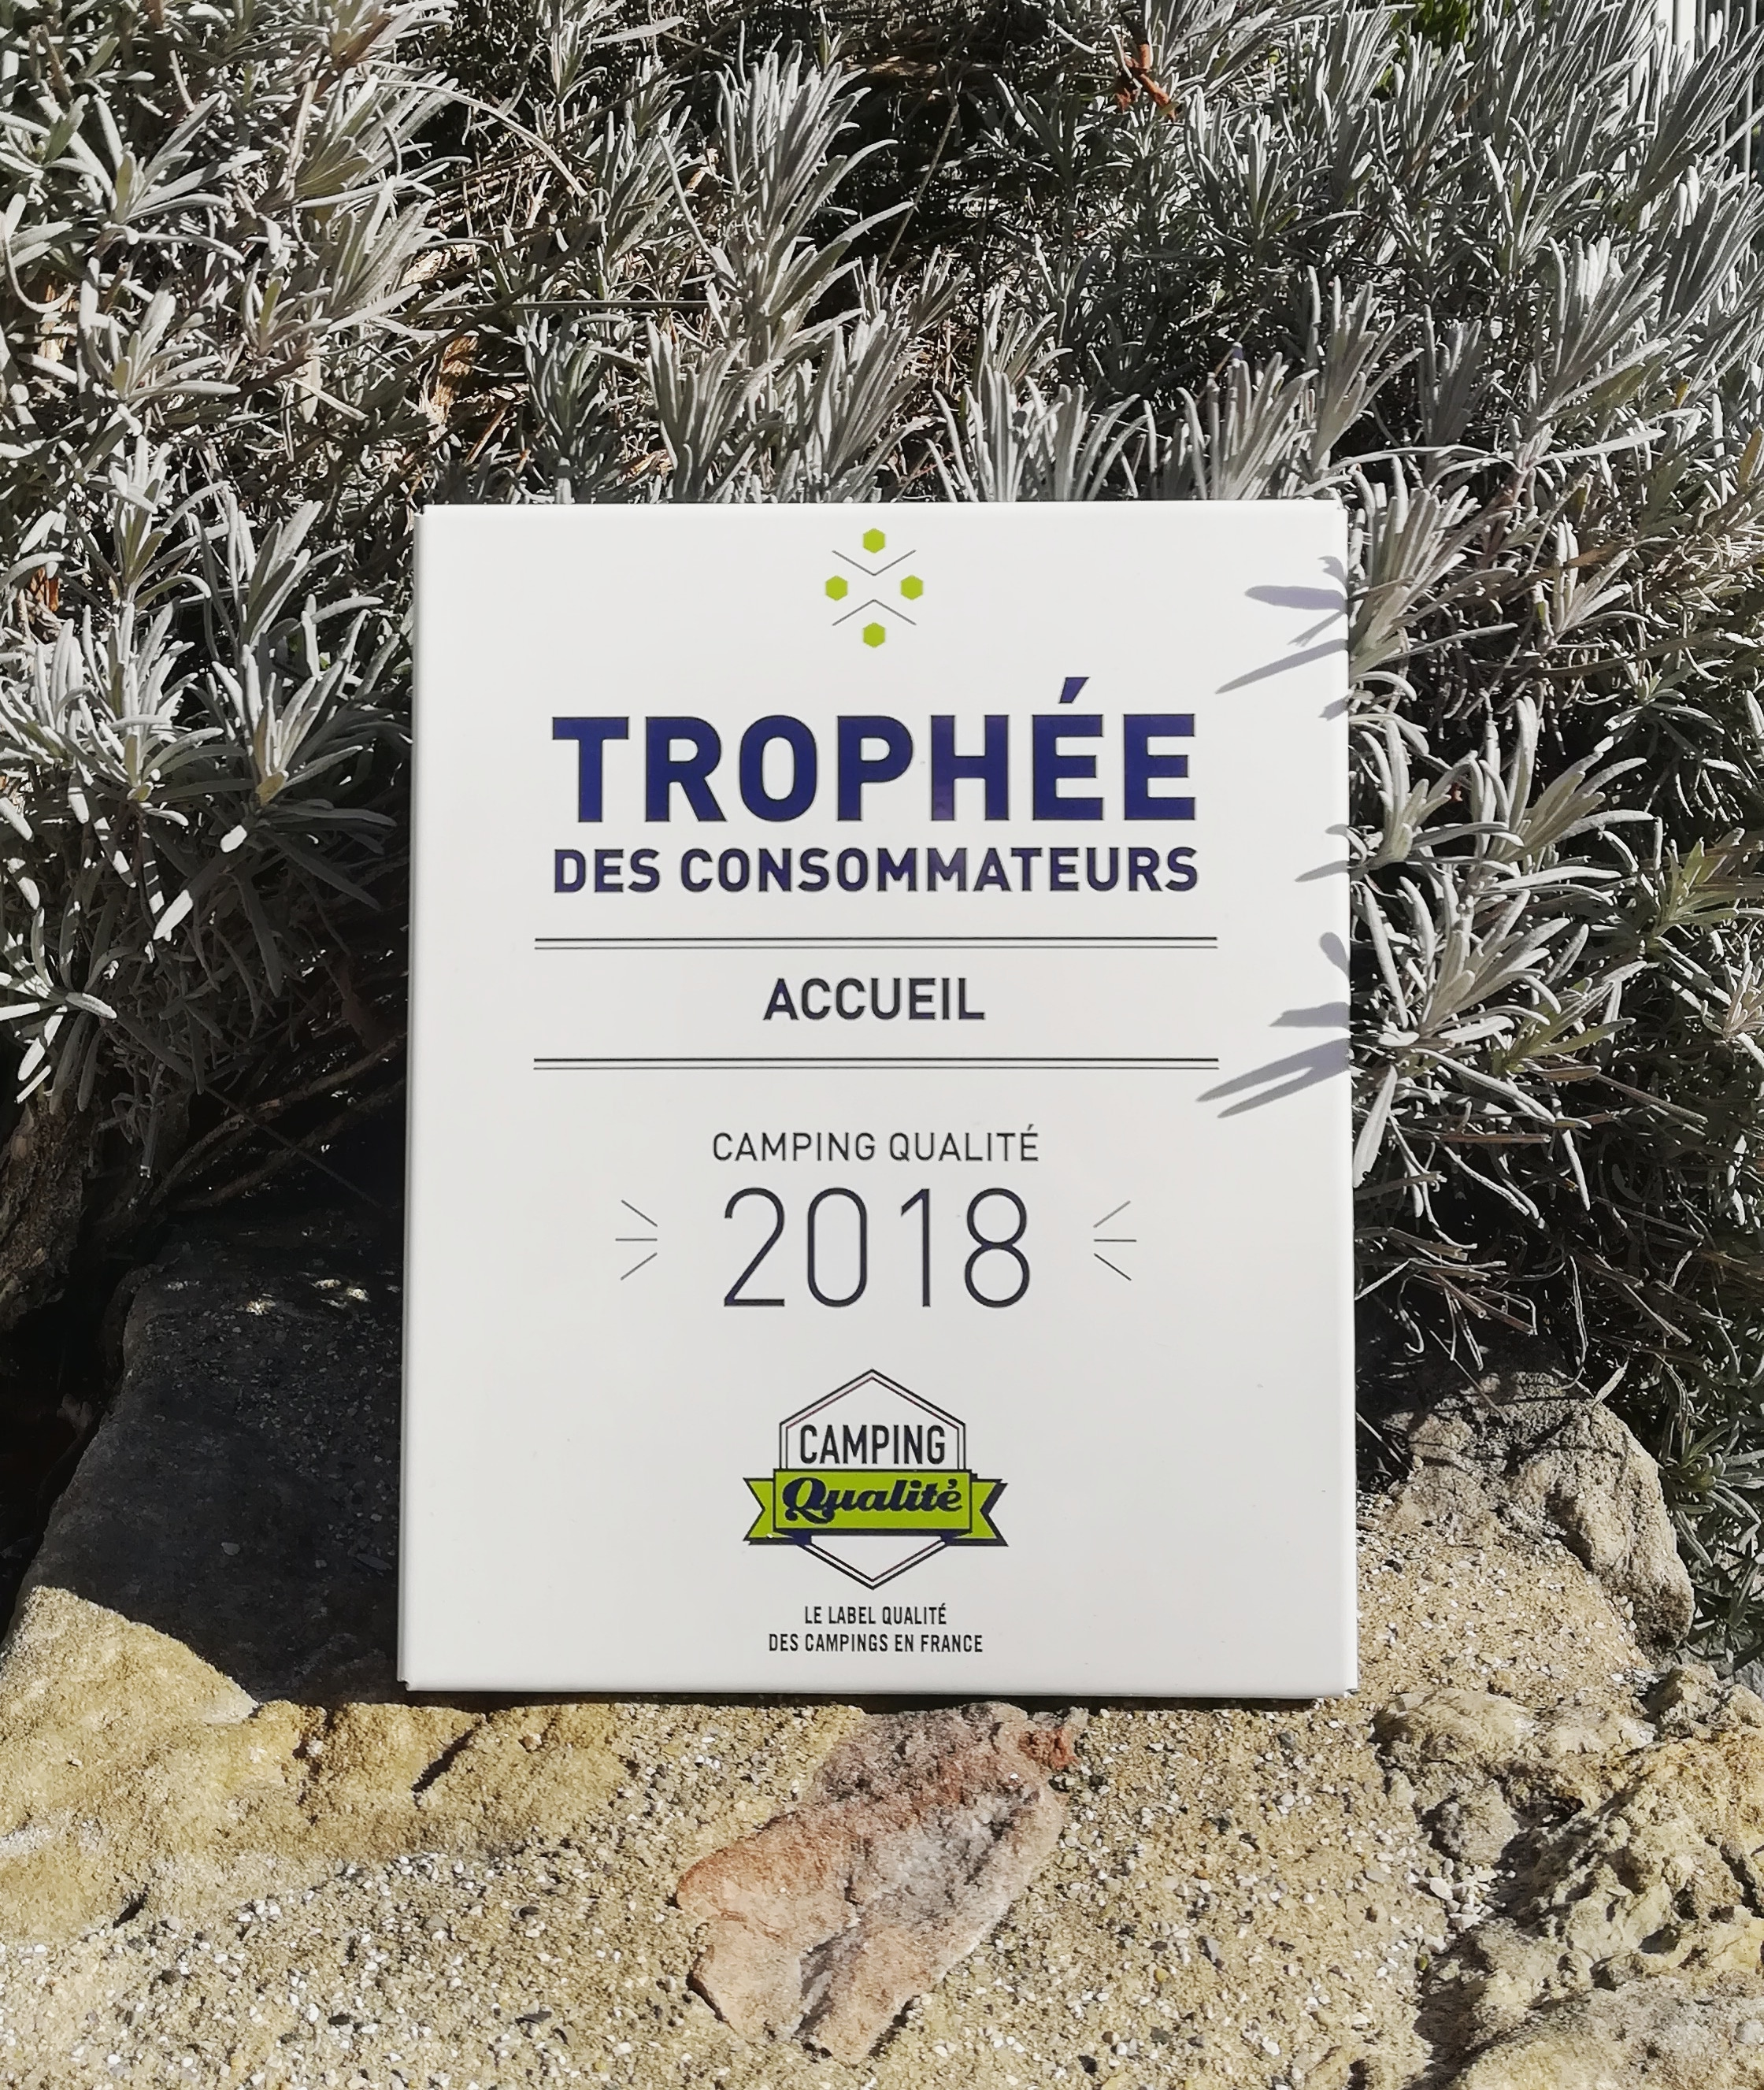 IMG 20190222 150457 611 - Quality trophy